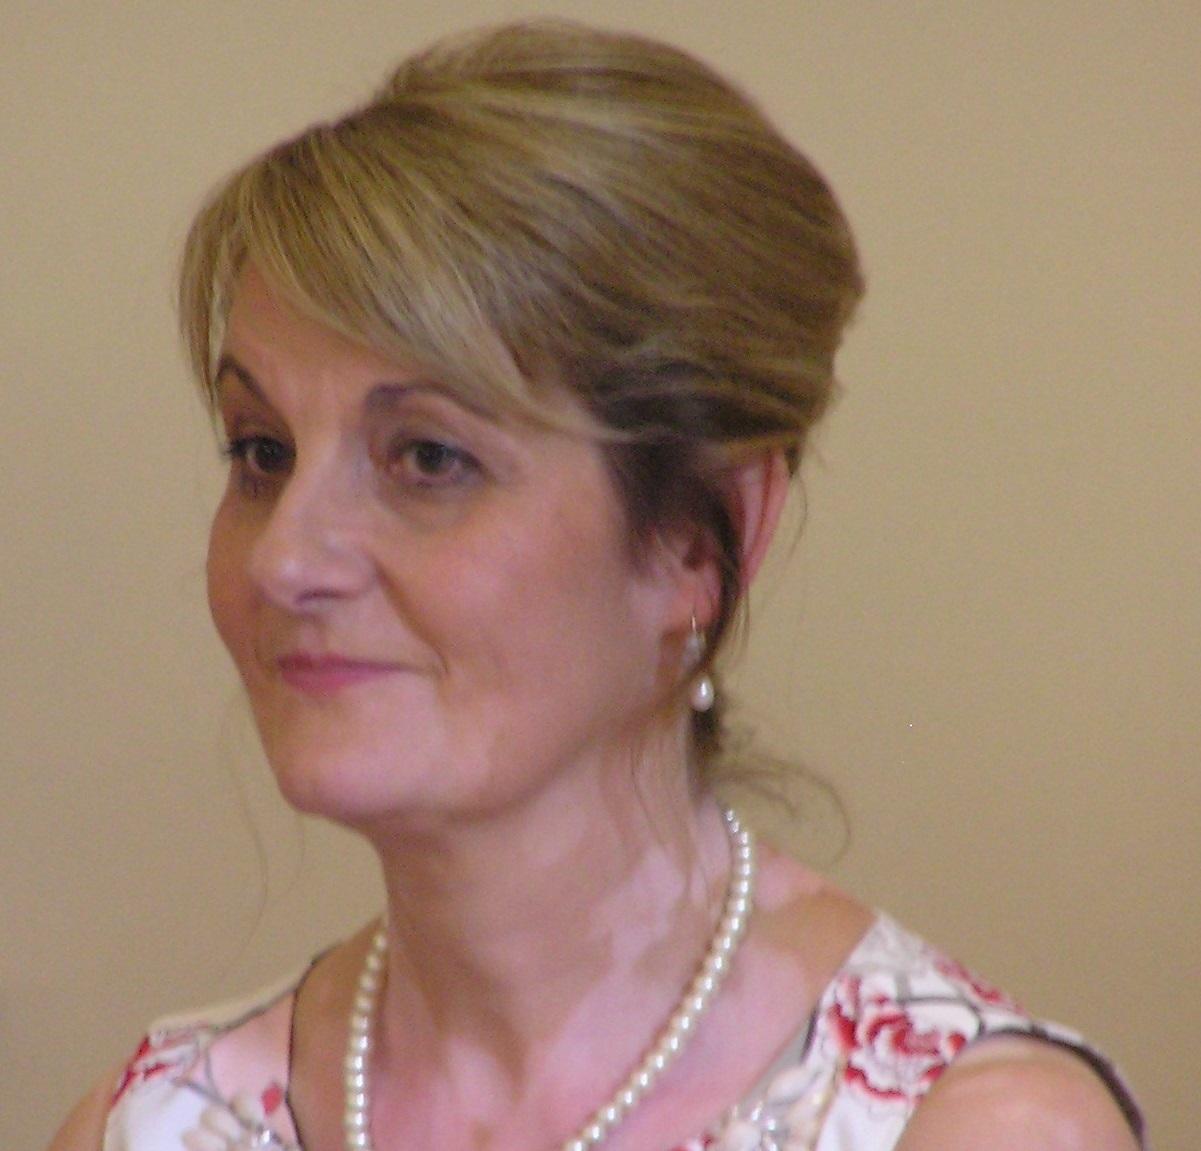 Helen Tuckwood Living With Vitiligo The Bmj